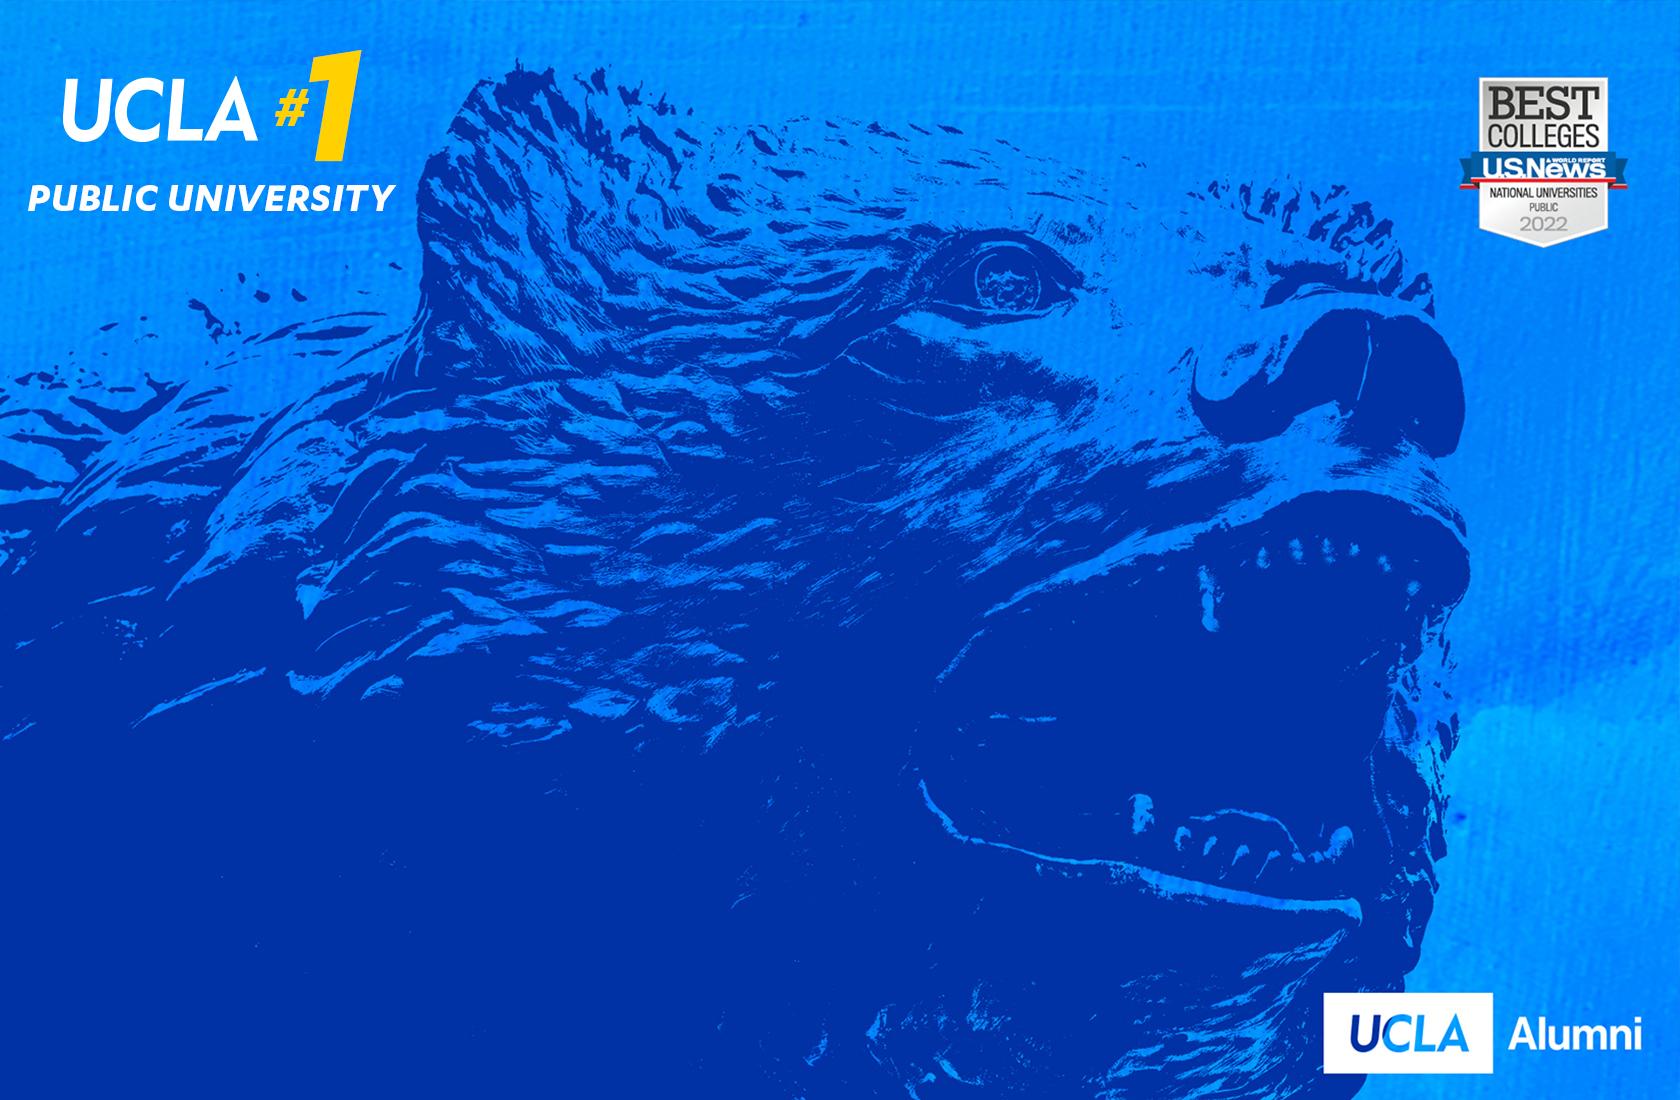 UCLA Blue Bruin Bear announcing that UCLA is the #1 Public University